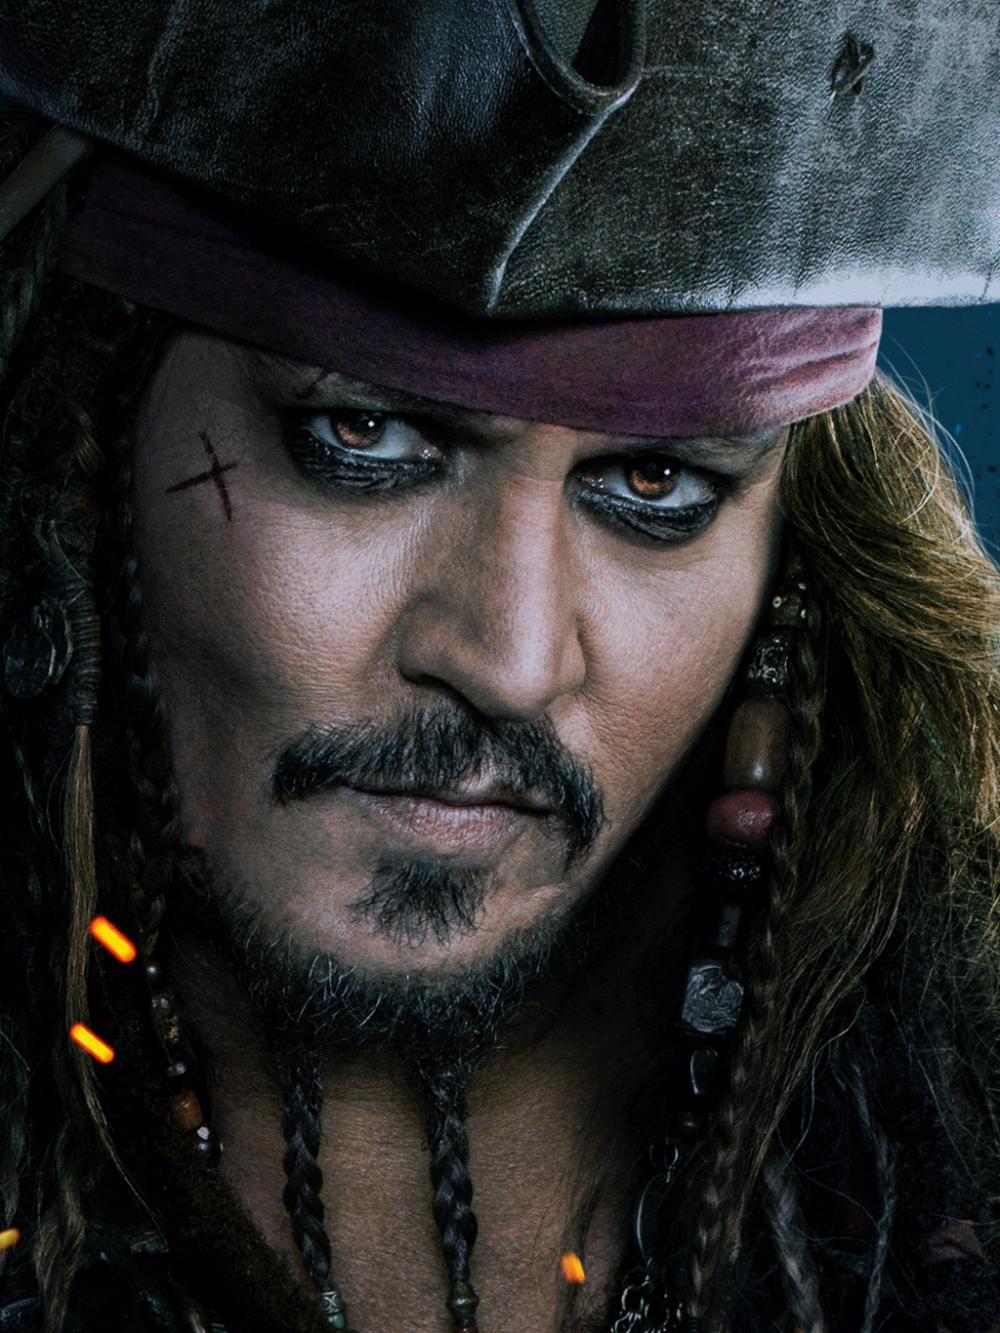 2048x2732 Background Caribbean Full Ghost Jack Phonebackgroundsdisneypirates Pirates Jack Sparrow Tattoos Jack Sparrow Wallpaper Jack Sparrow Drawing